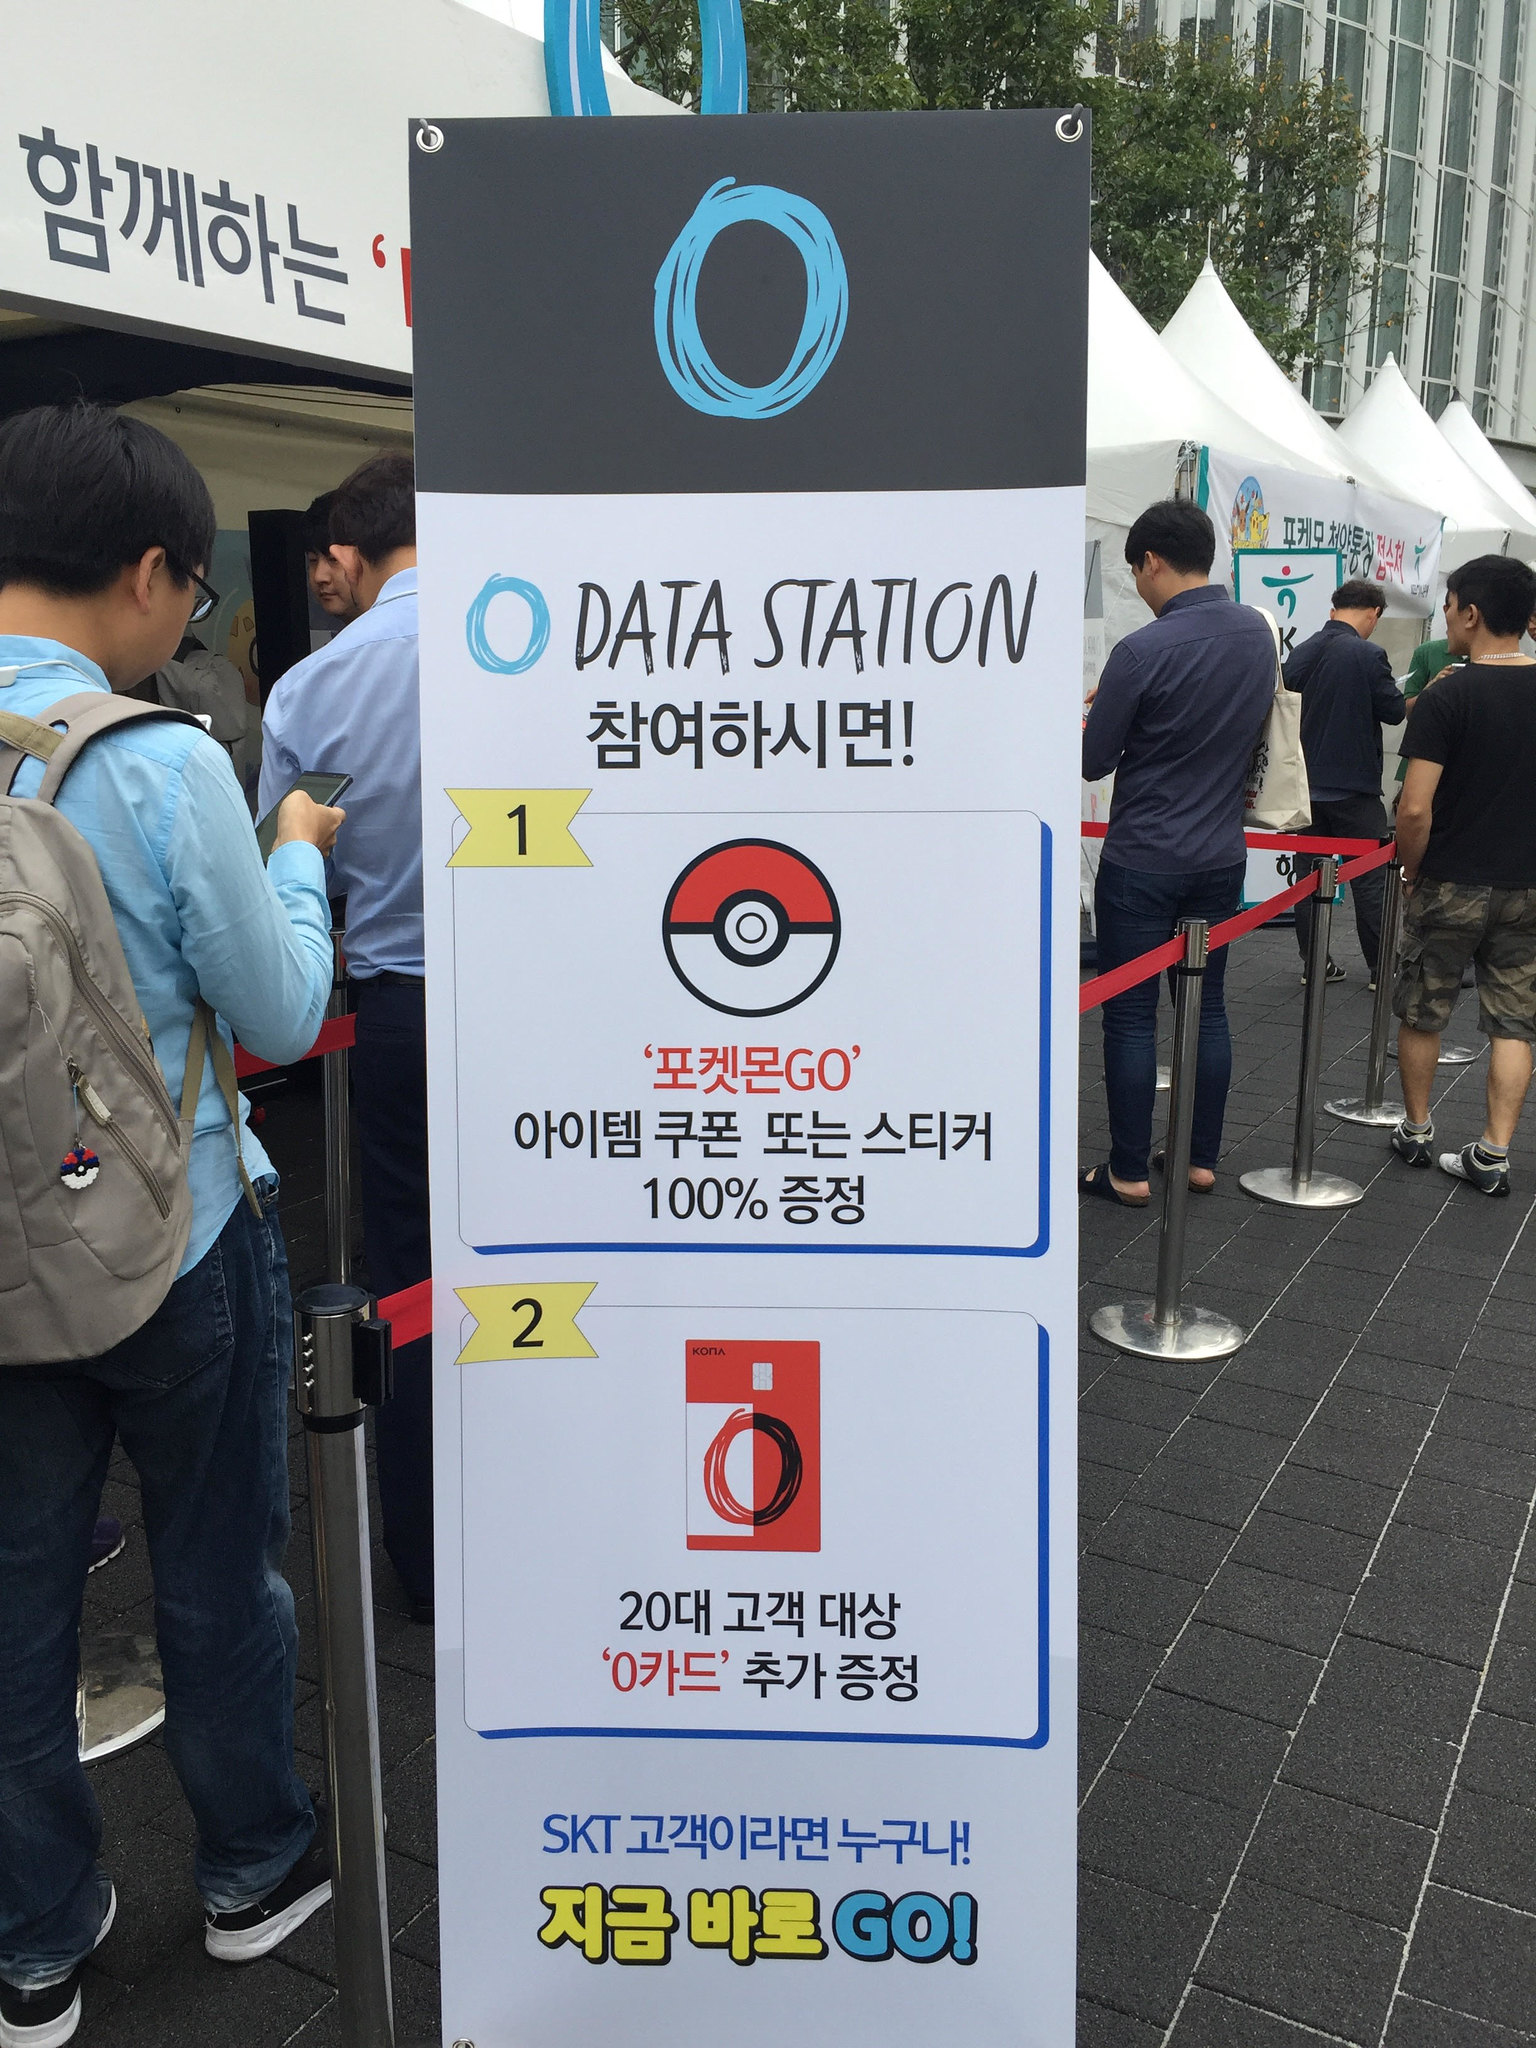 keb_hana_bank_and_sk_telecom_pokemon_go_week_at_pokemon_fest_2018_data_station